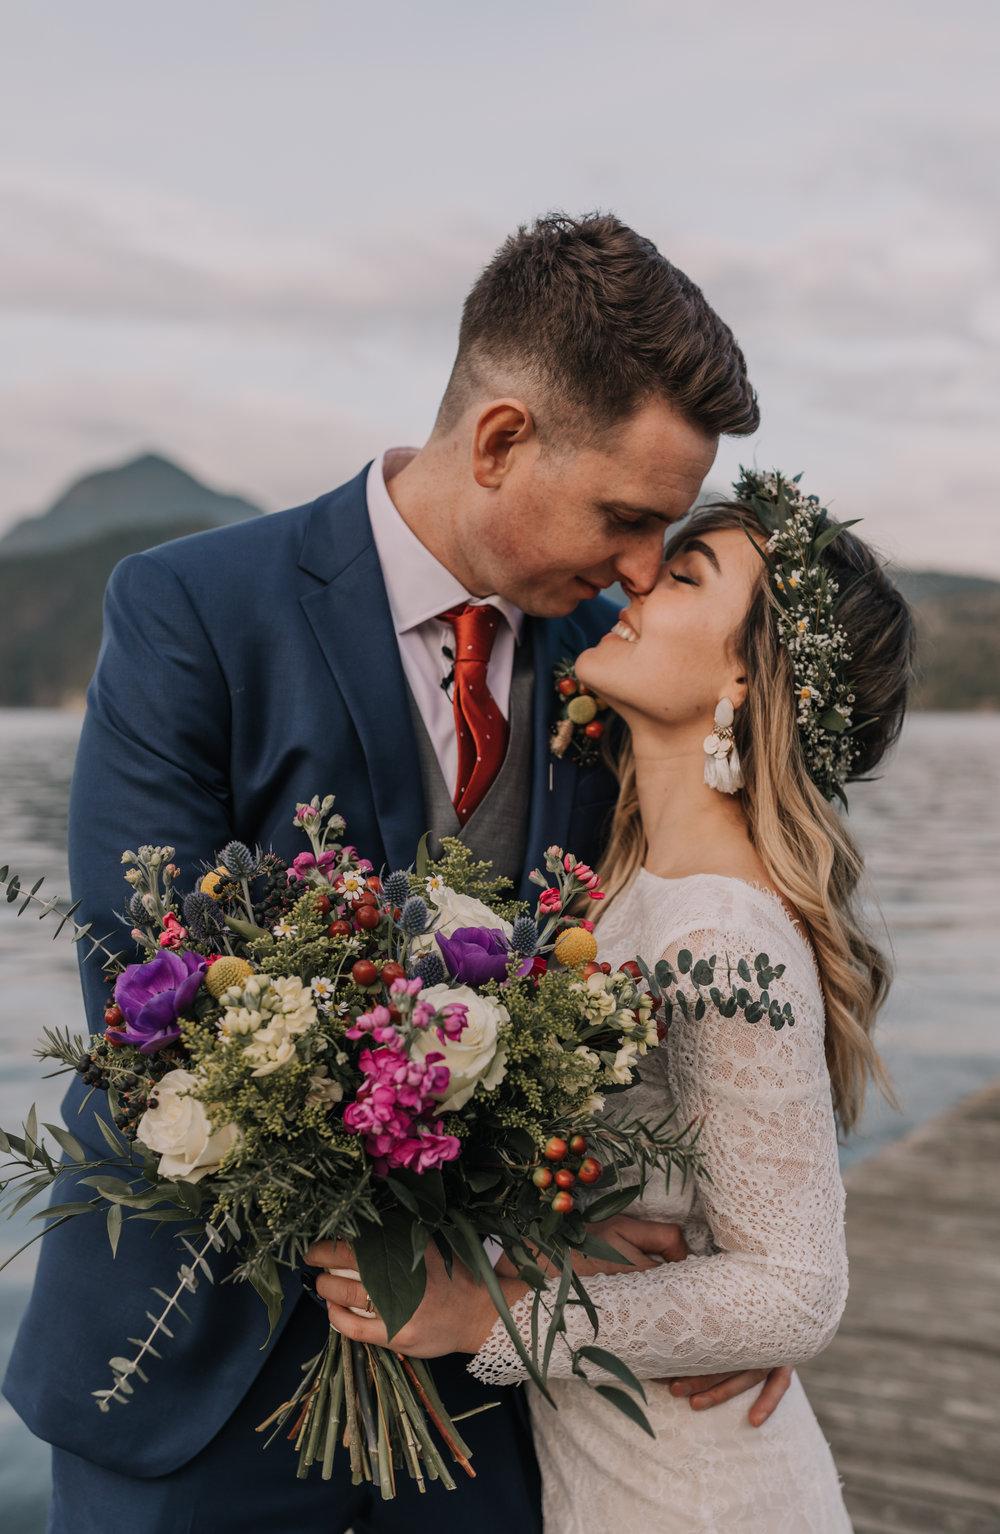 Sunshine Coast Wedding Photos - Mountain Wedding Photos - Sunshine Coast Wedding Photographer - Vancouver Wedding Photographer - Jennifer Picard156-1.JPG